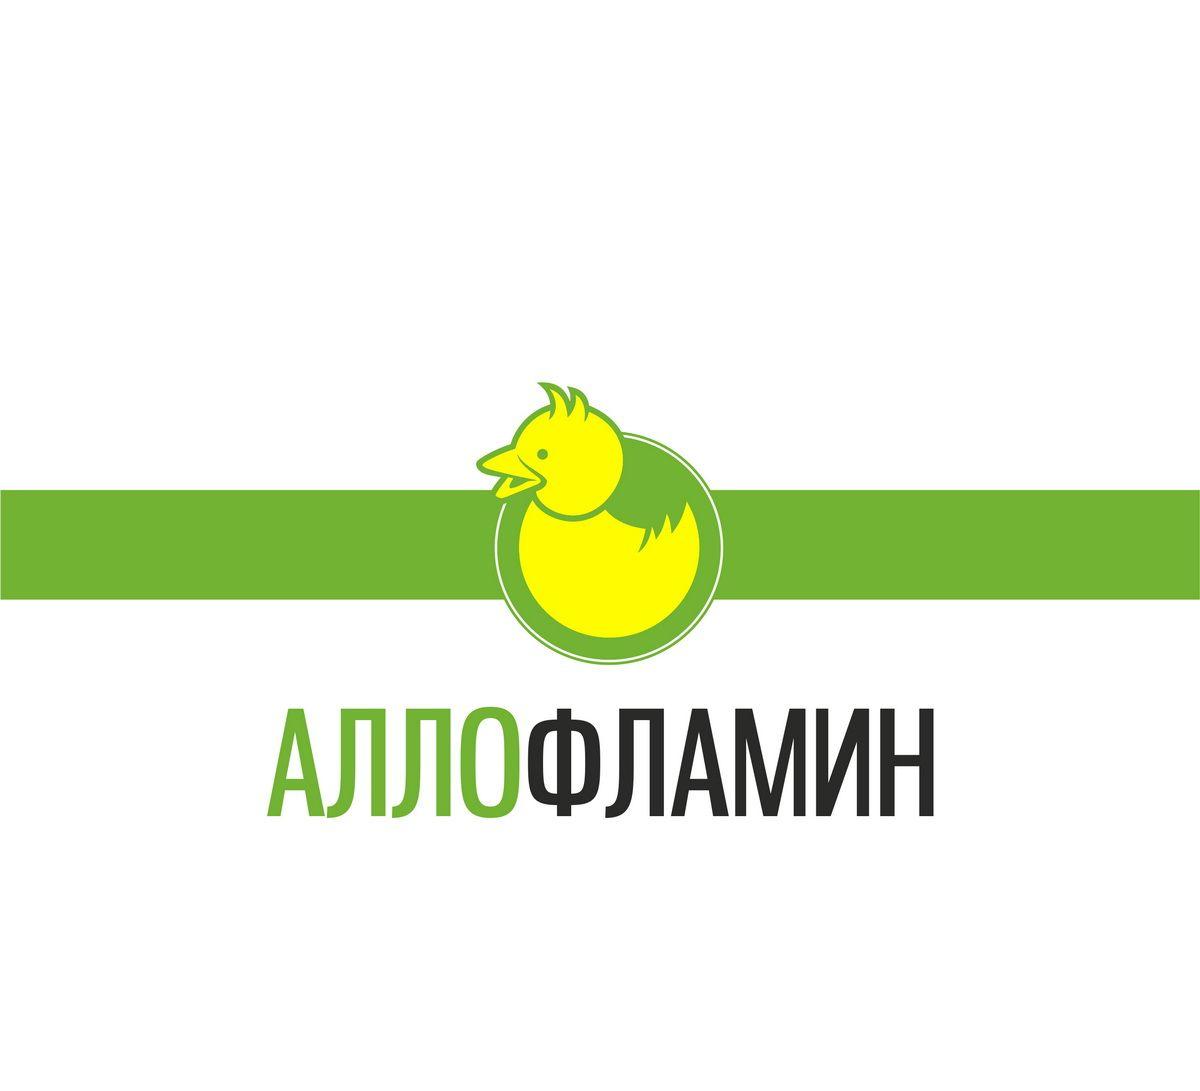 Логотип препарата Аллофламин - дизайнер BogDIC